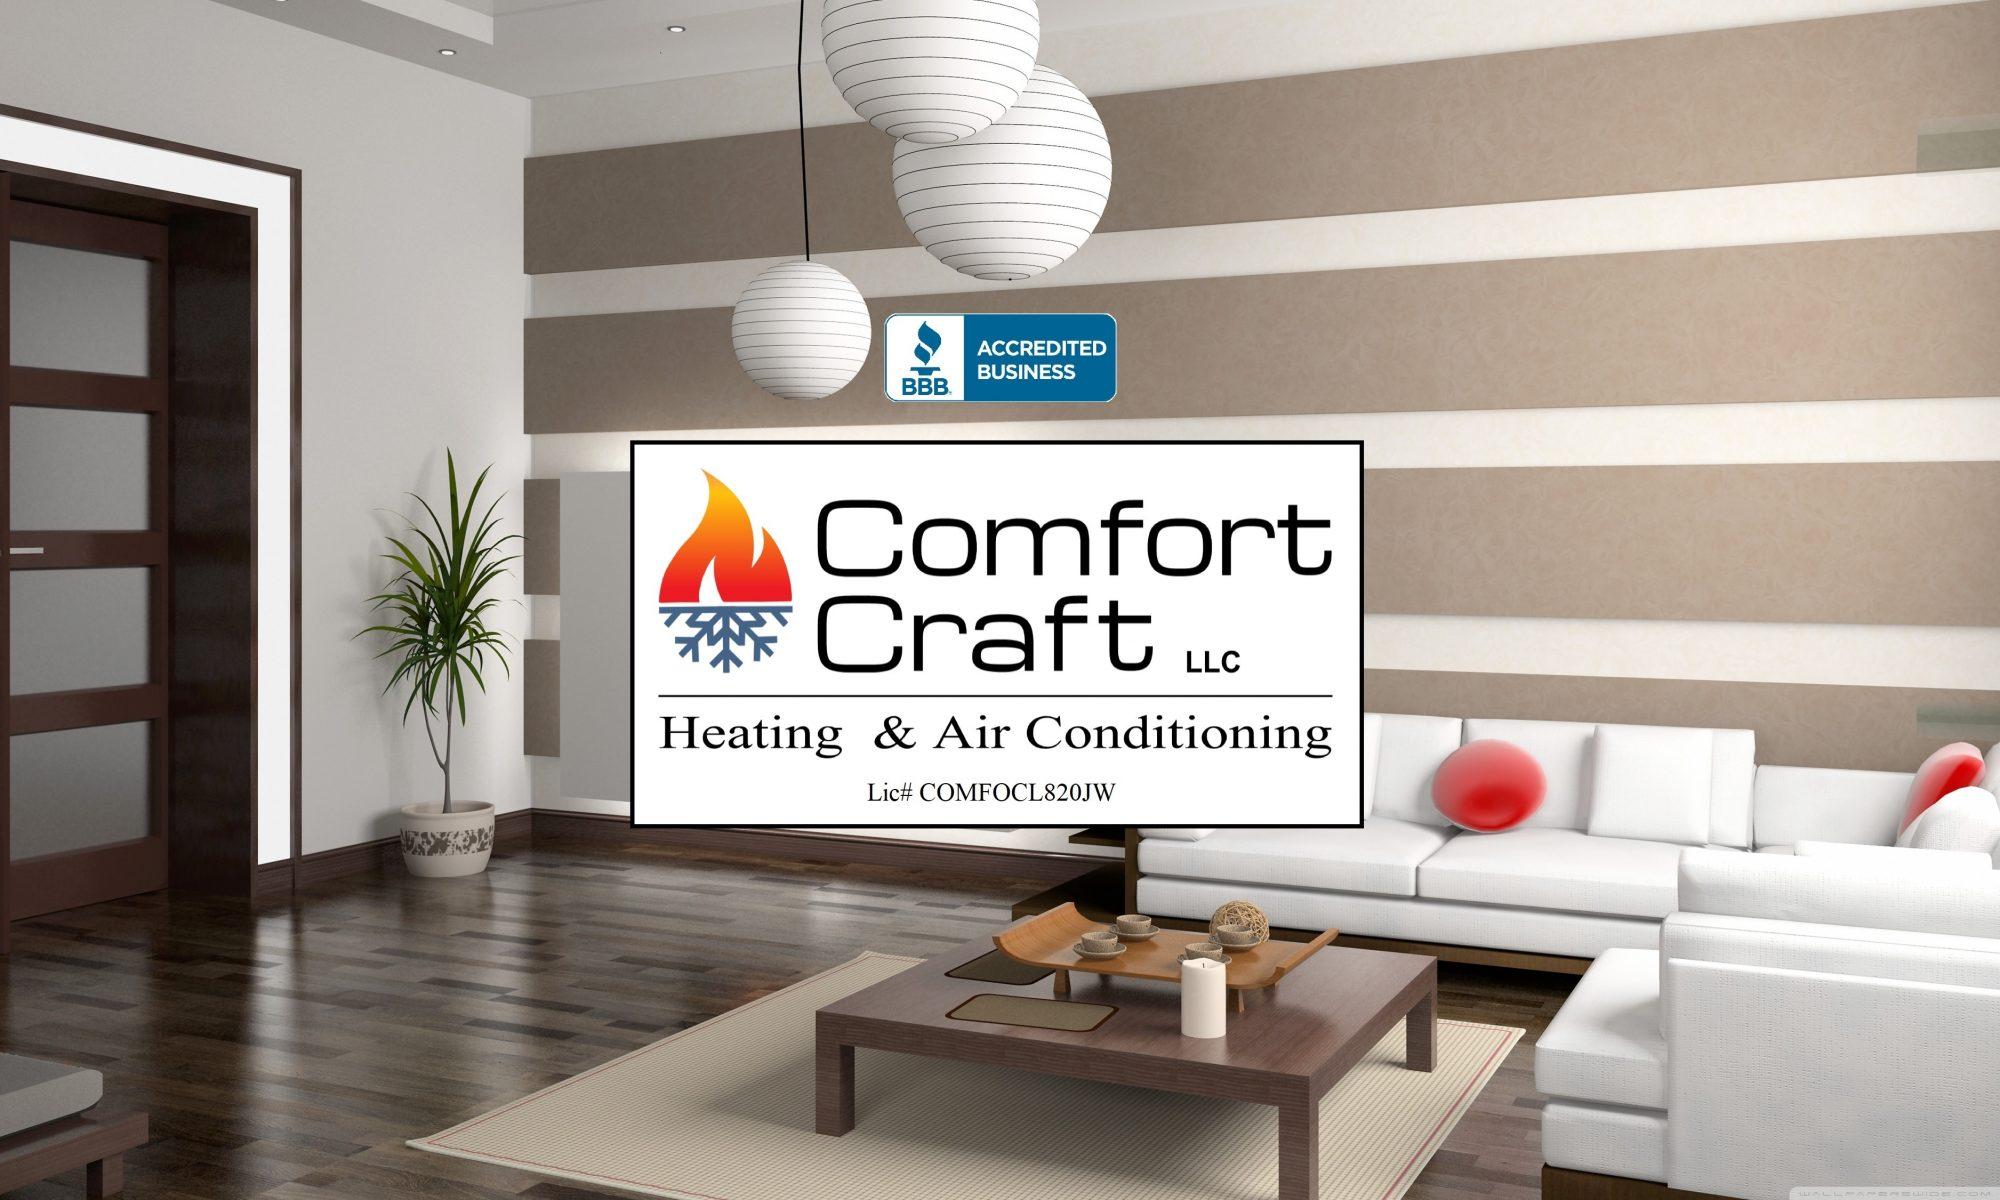 Comfort Craft LLC